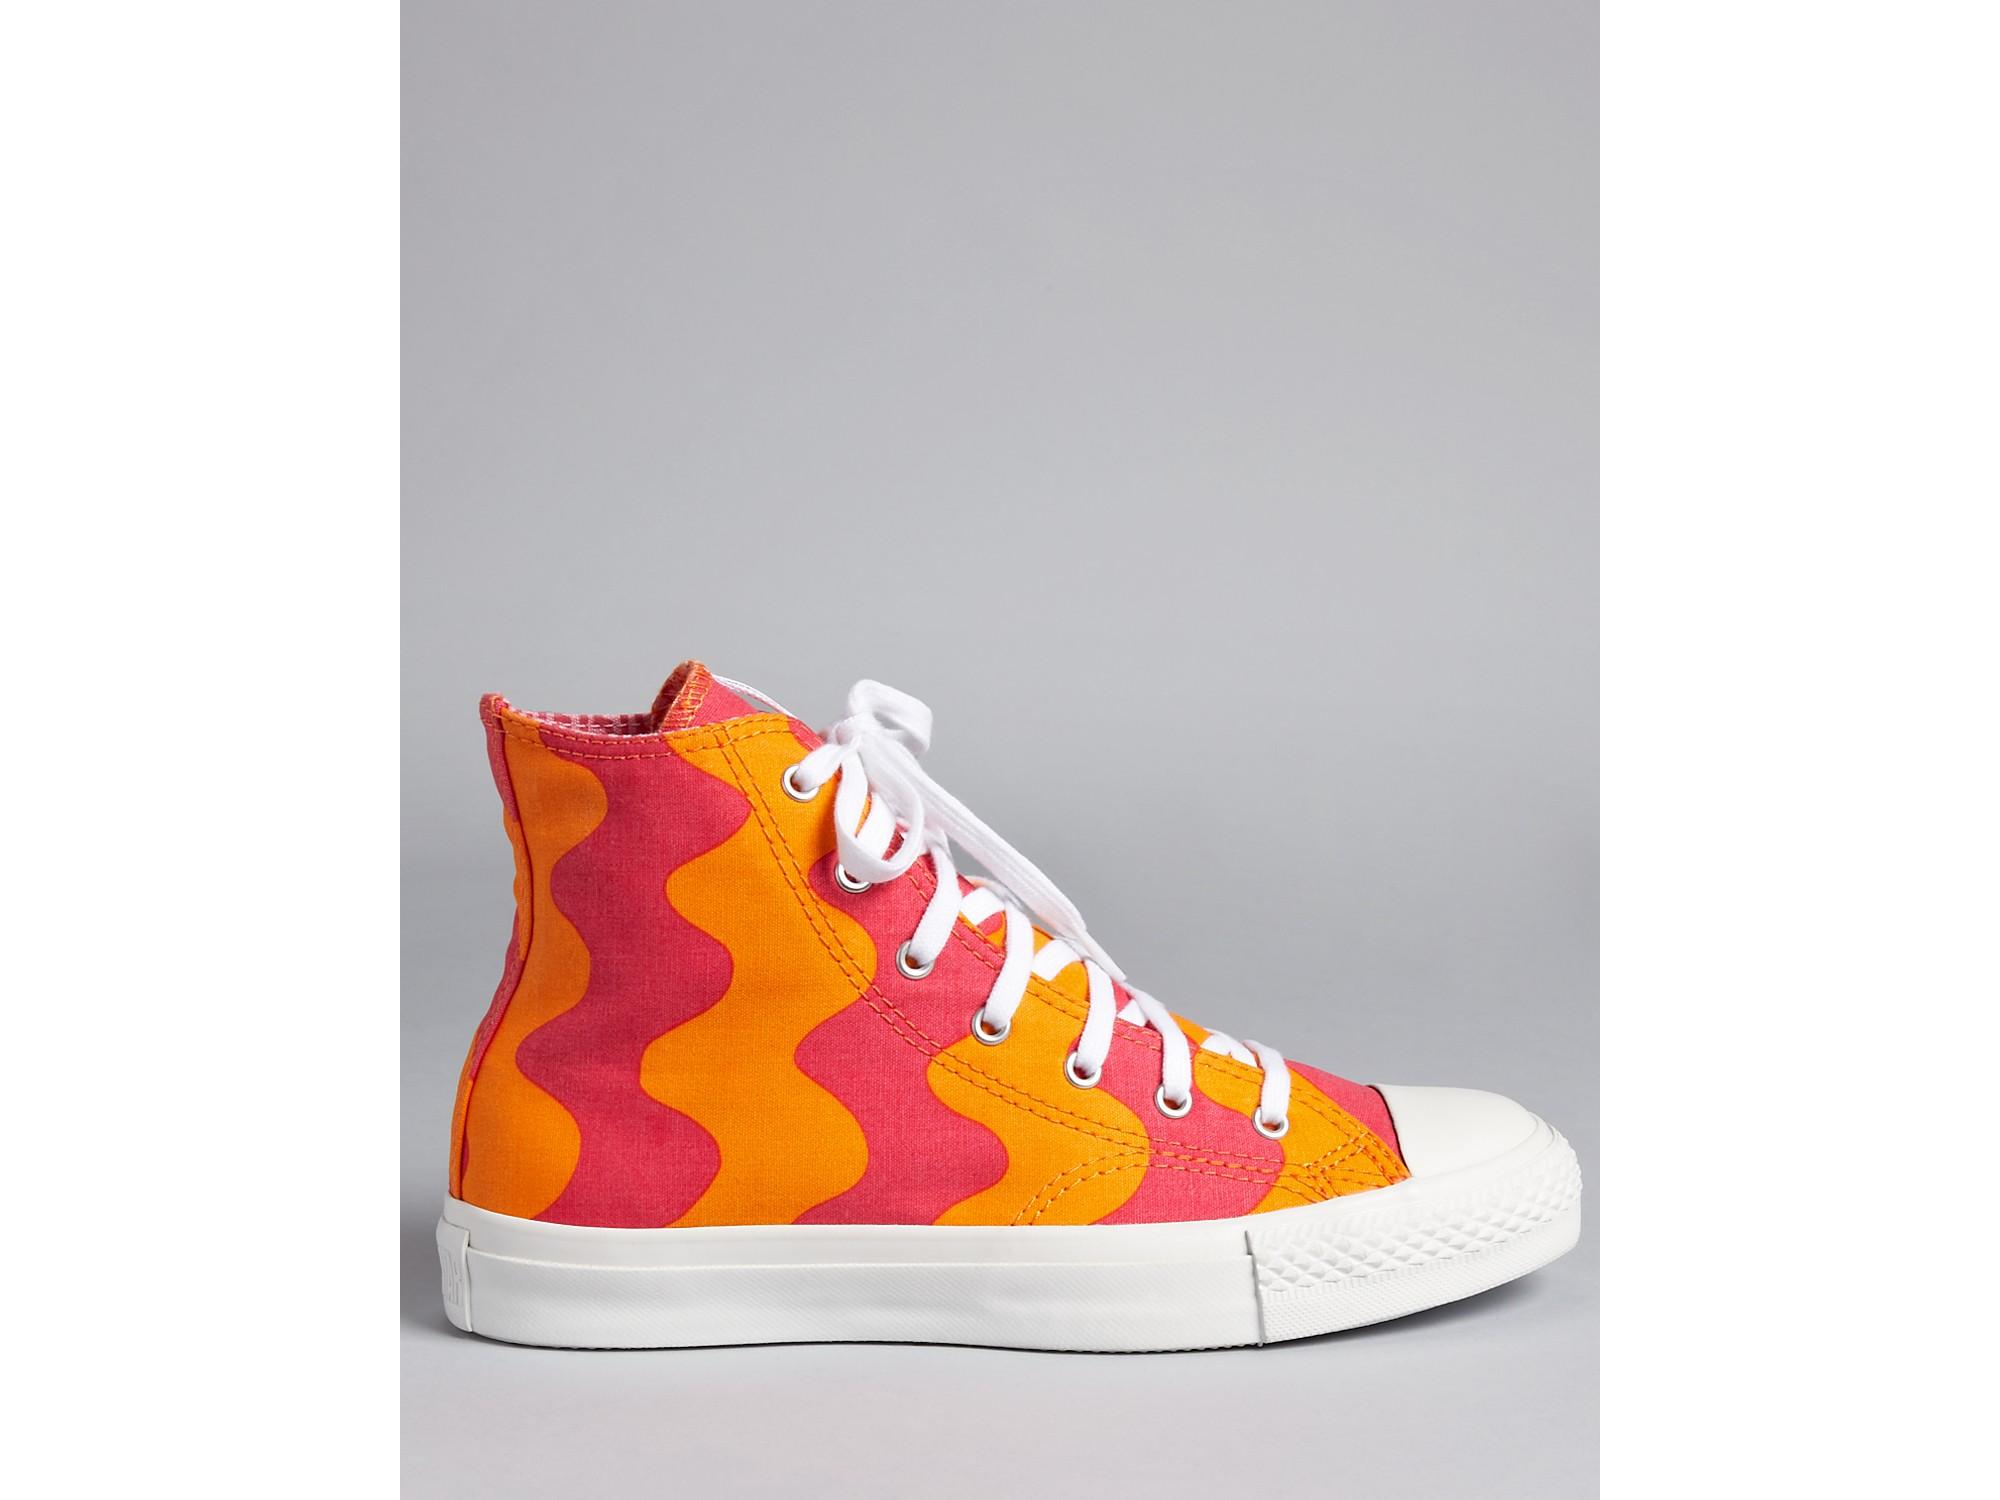 44374dfa9275 Lyst - Converse Chuck Taylor X Marimekko Sneakers All Star Premium ...